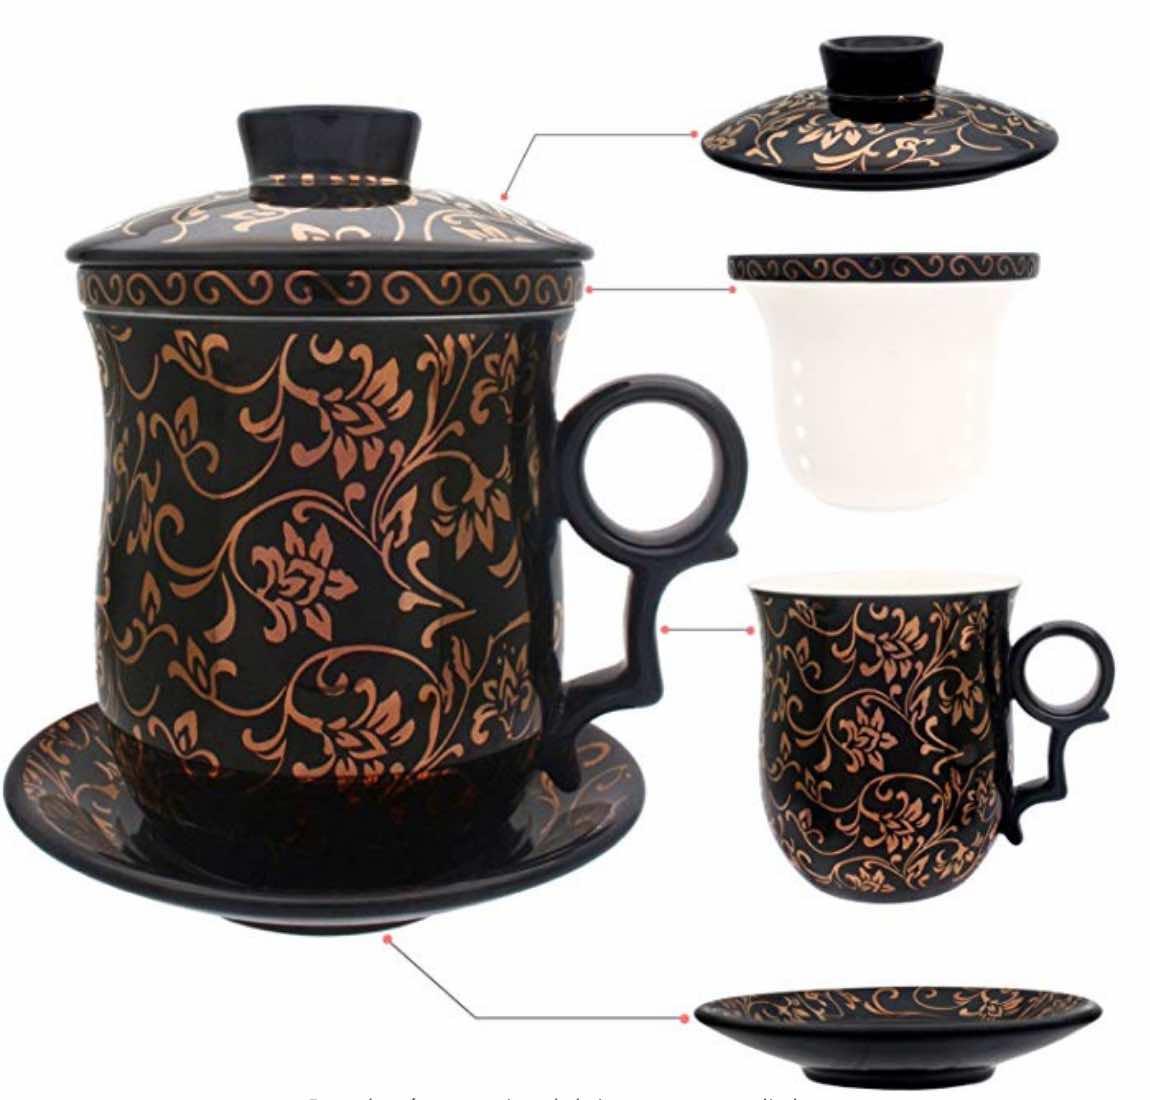 Taza de té de porcelana con tapa e infusor de platillo – Cerámica china Jingdezhen, taza de café, taza de té, sistema de preparación de té para el hogar y la oficina